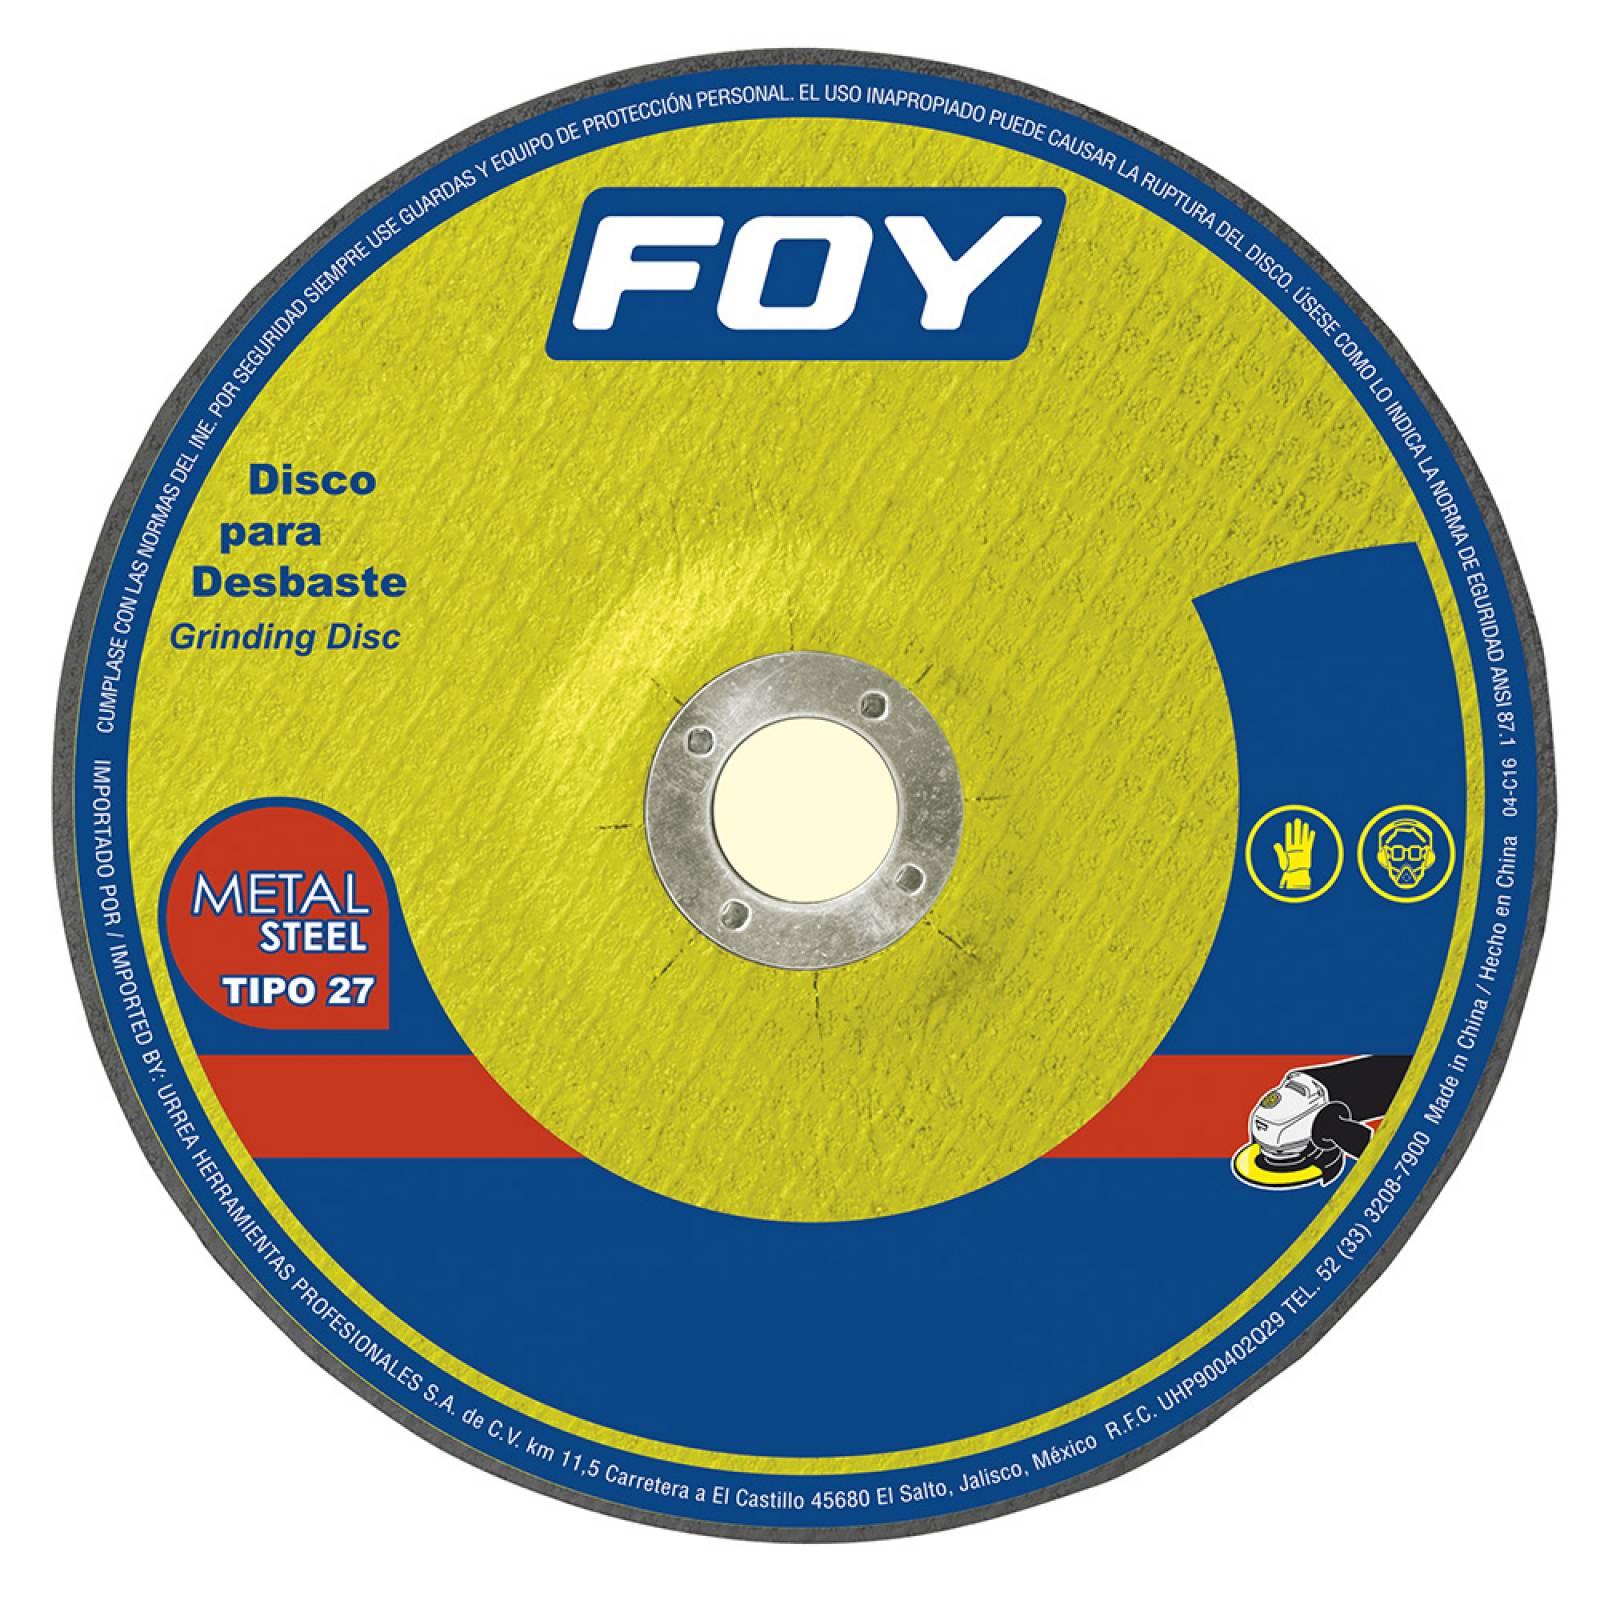 Disco T/27 Metal 4-1/2X3Mm 143522 Foy